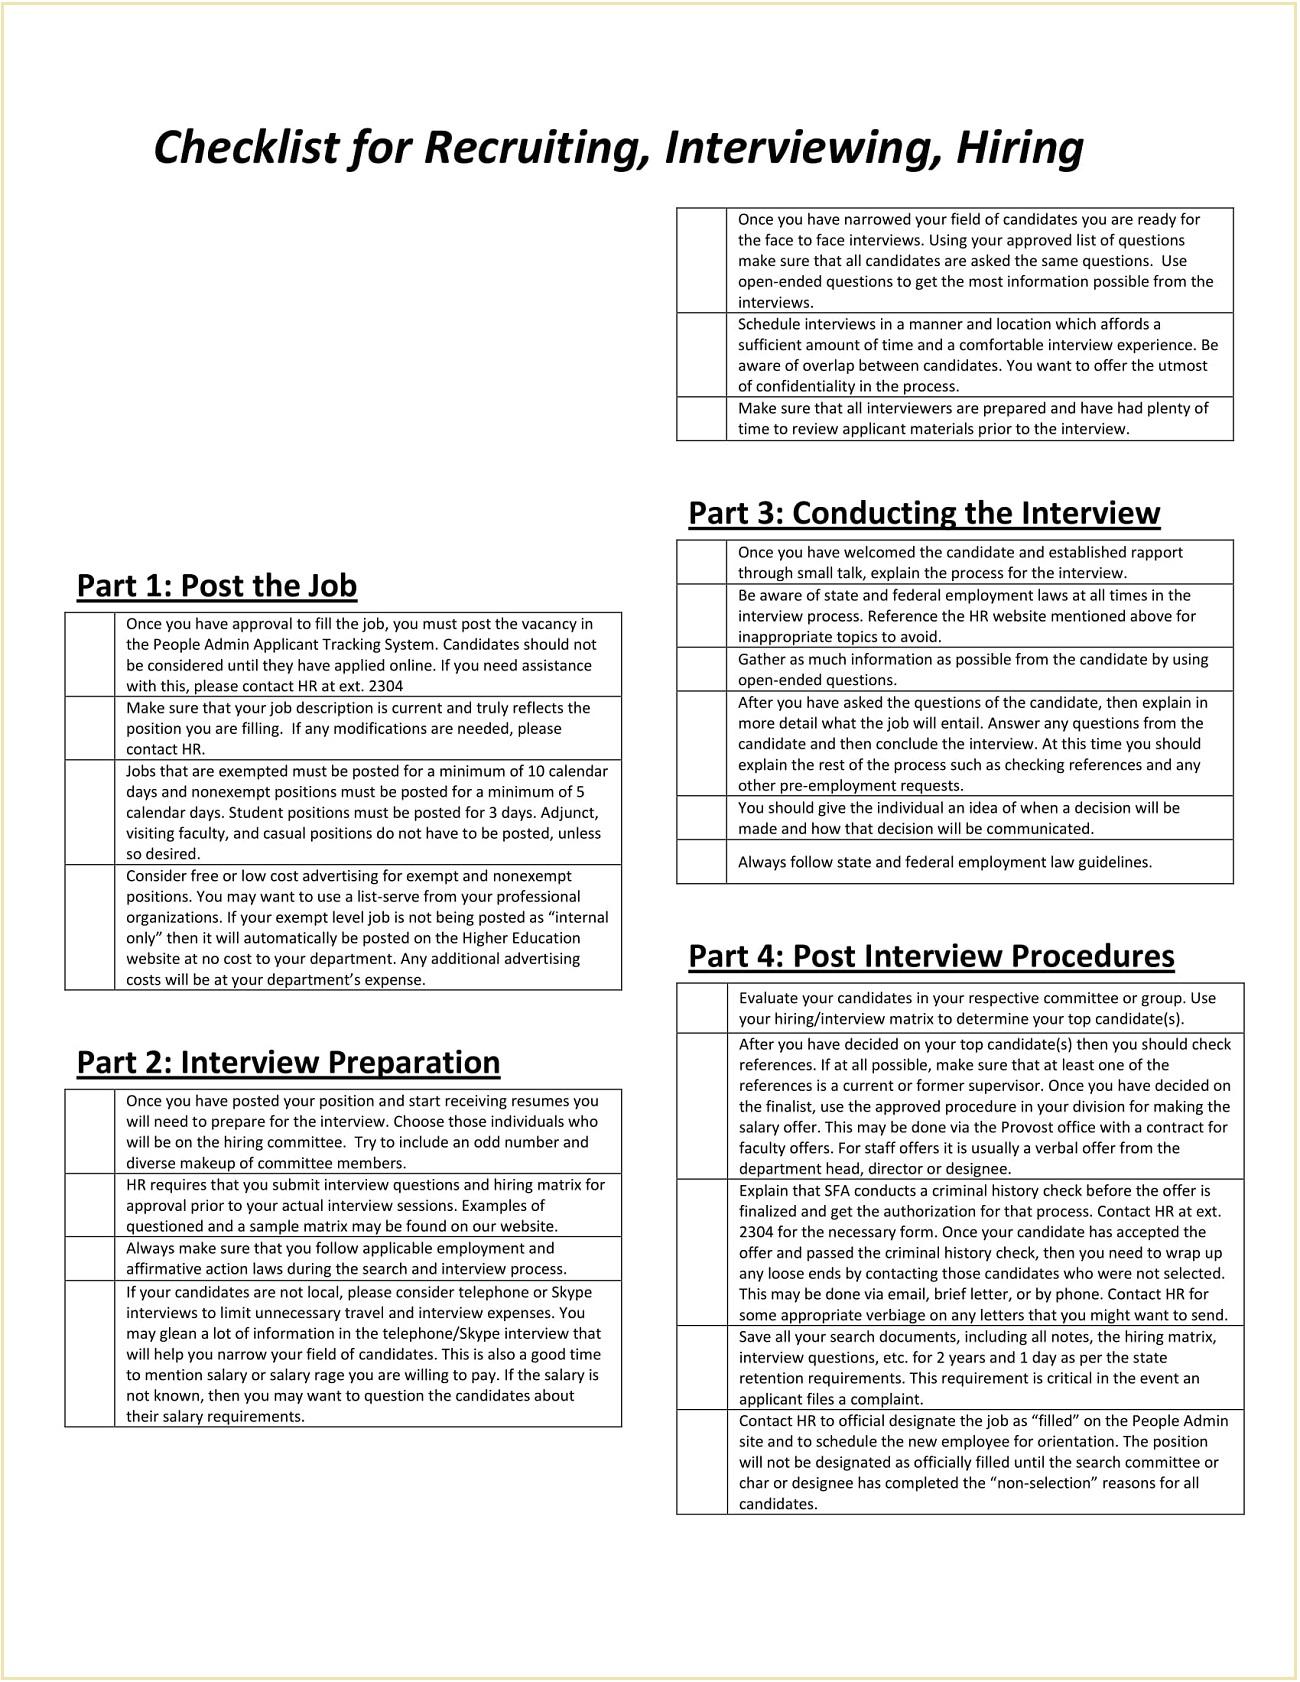 Checklist for Recruitment Template Form PDF